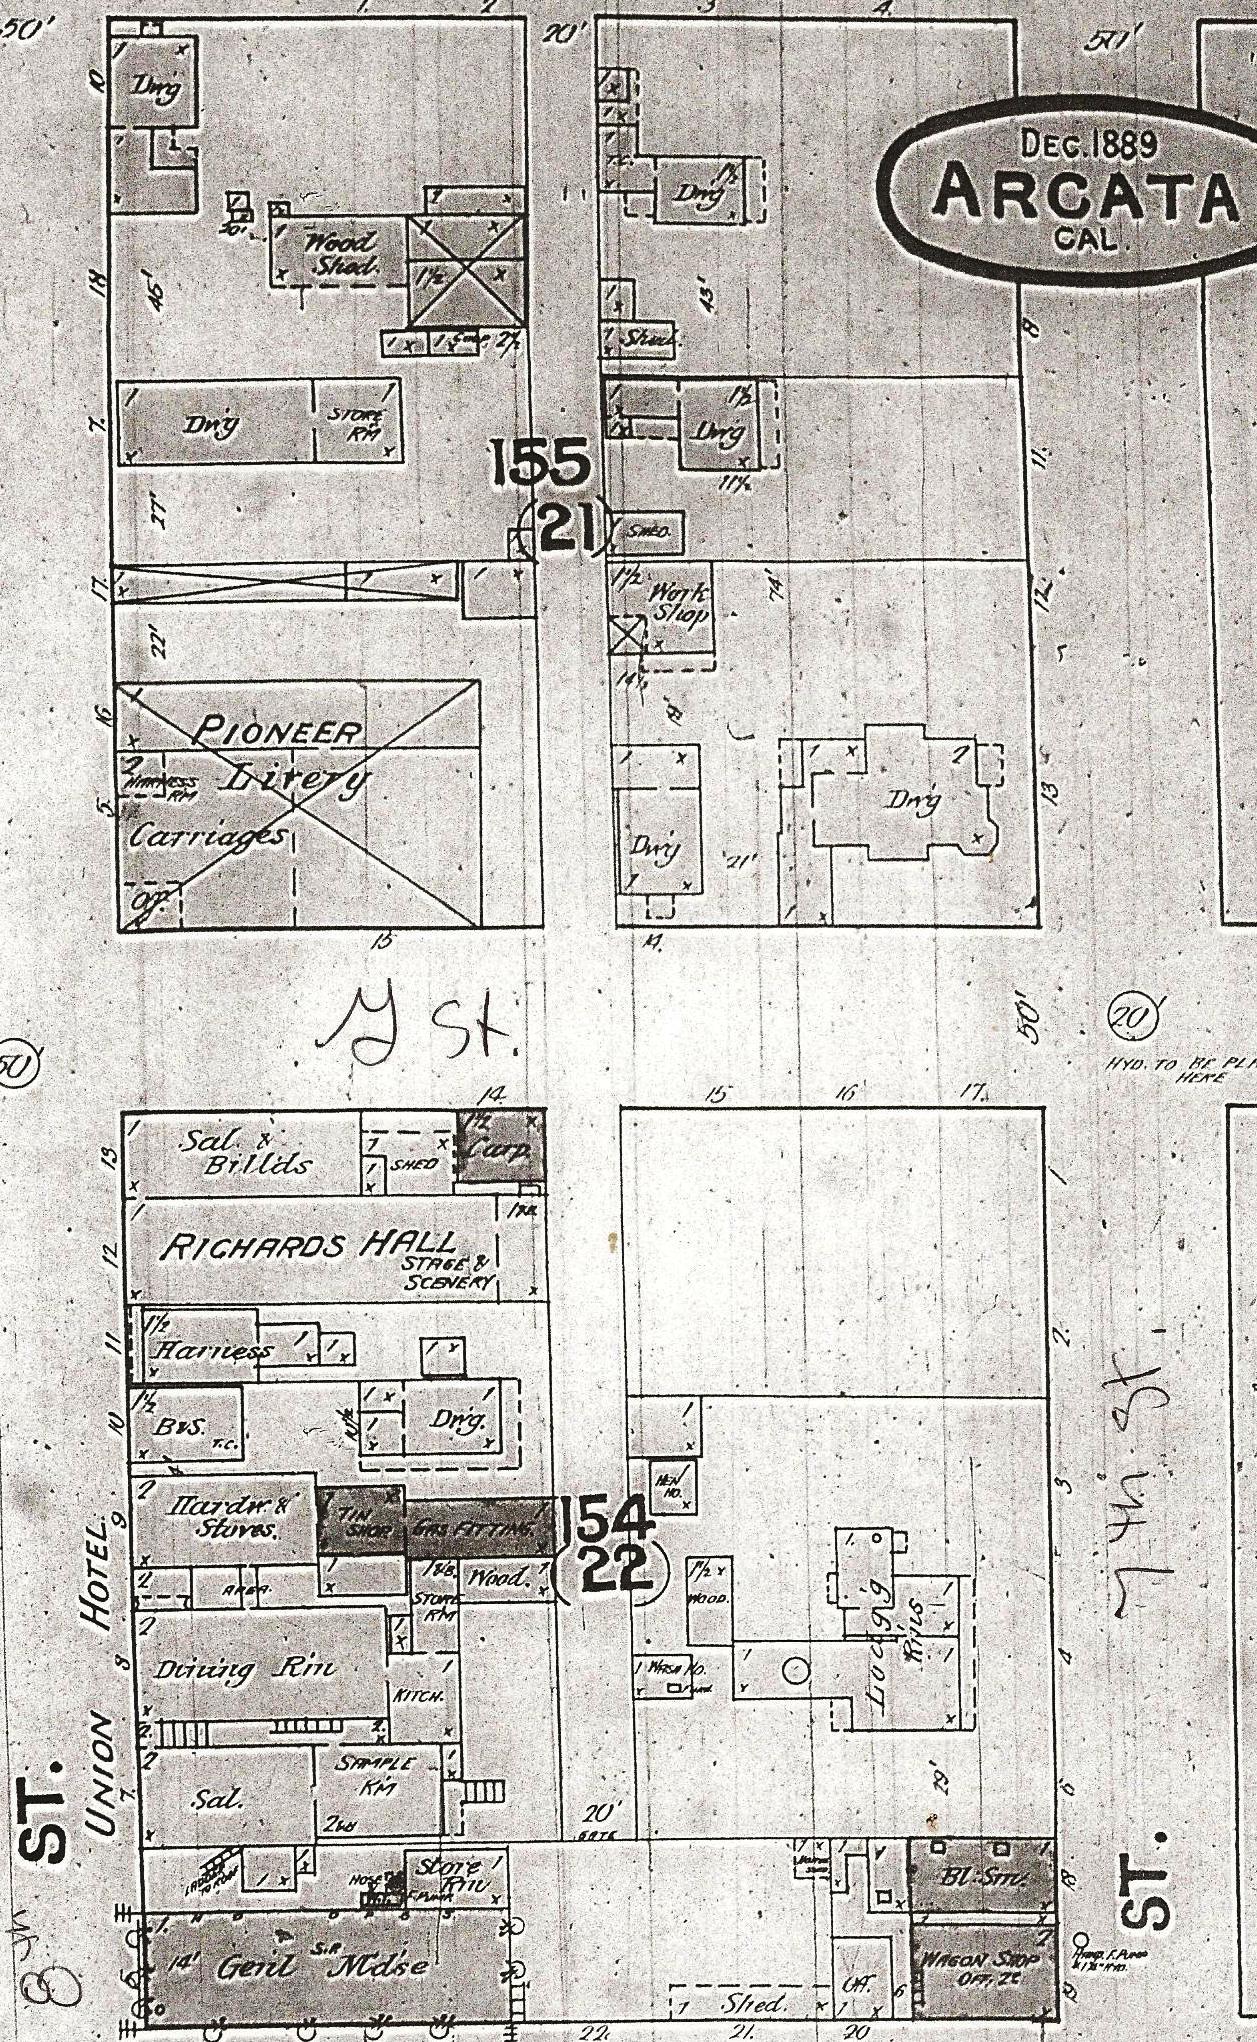 Old Arcata California Maps Lynette S Norcal History Blog